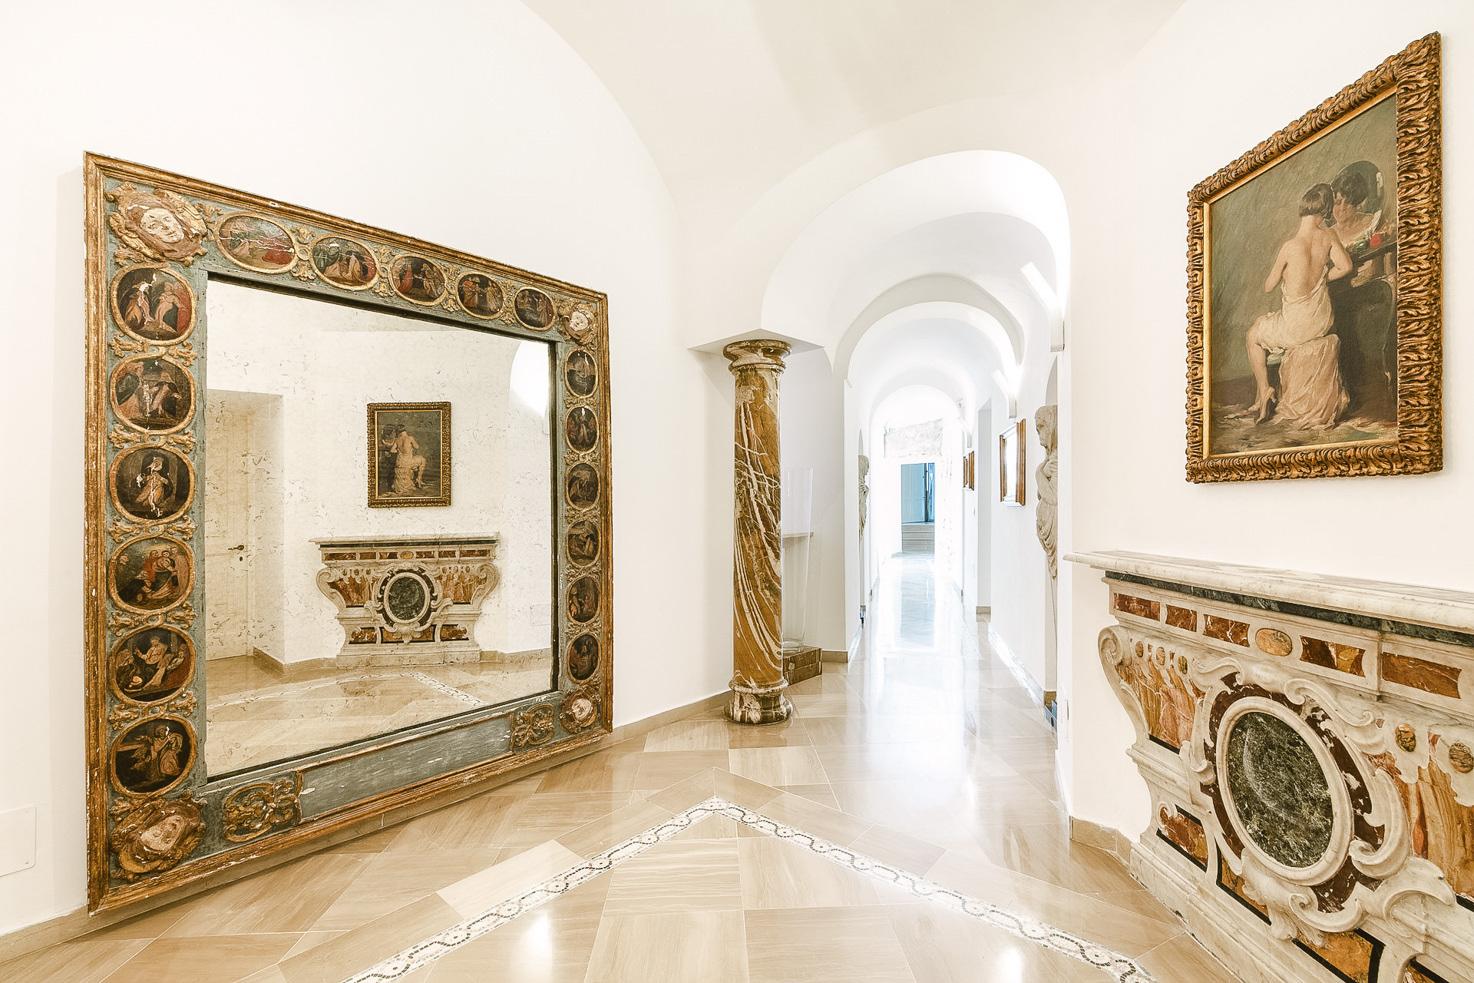 Corridor on the ground floor